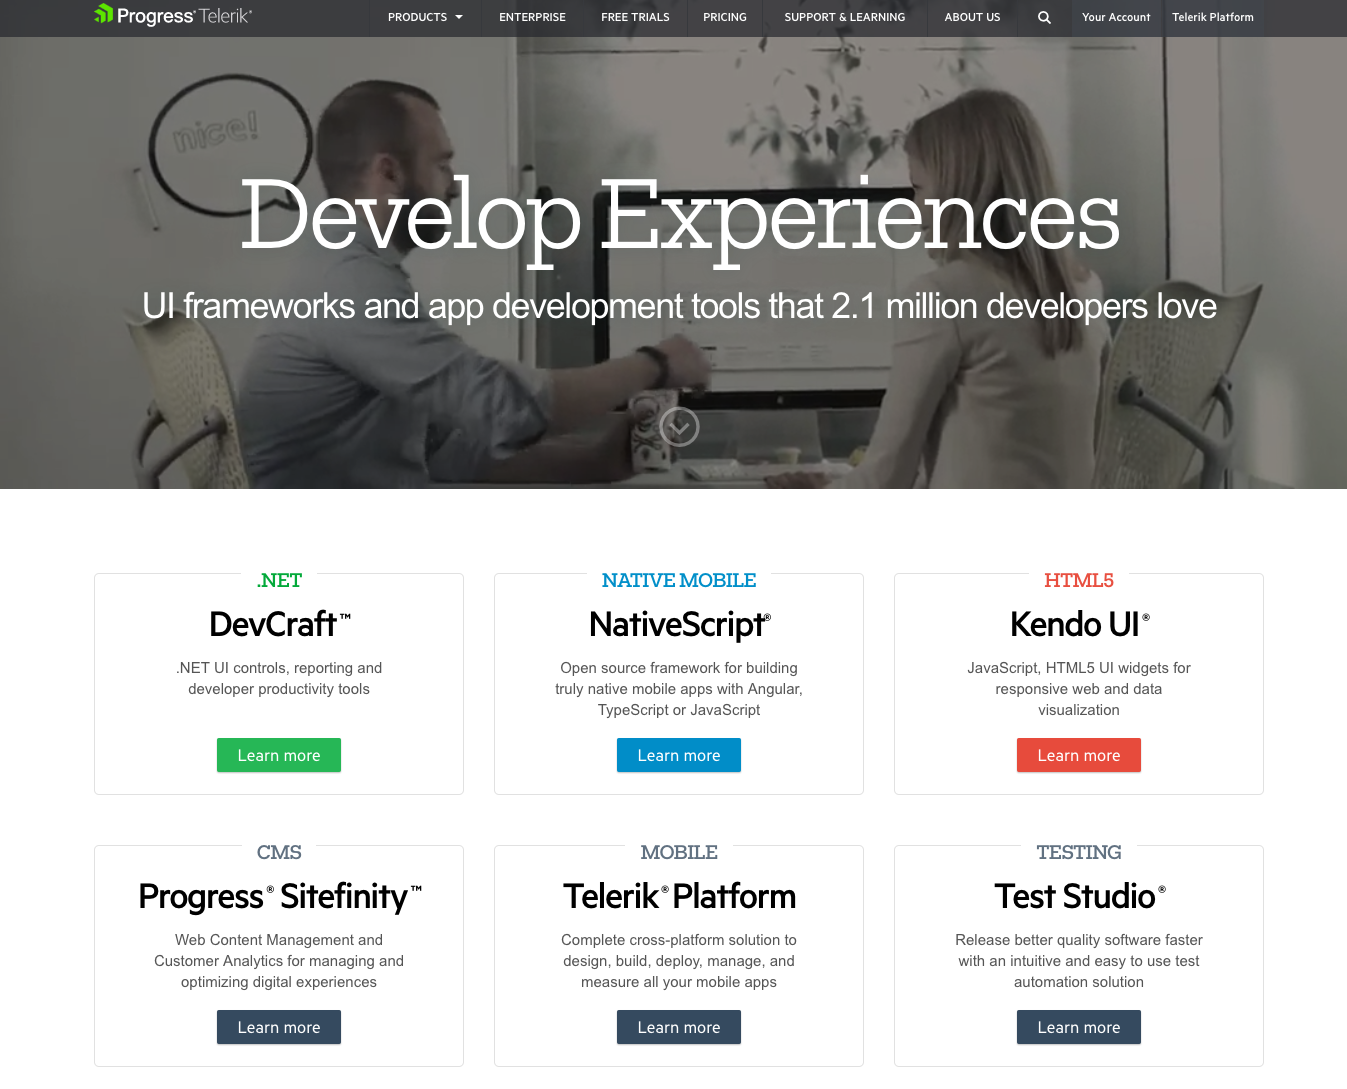 23 Of The Best Website Homepage Design Examples